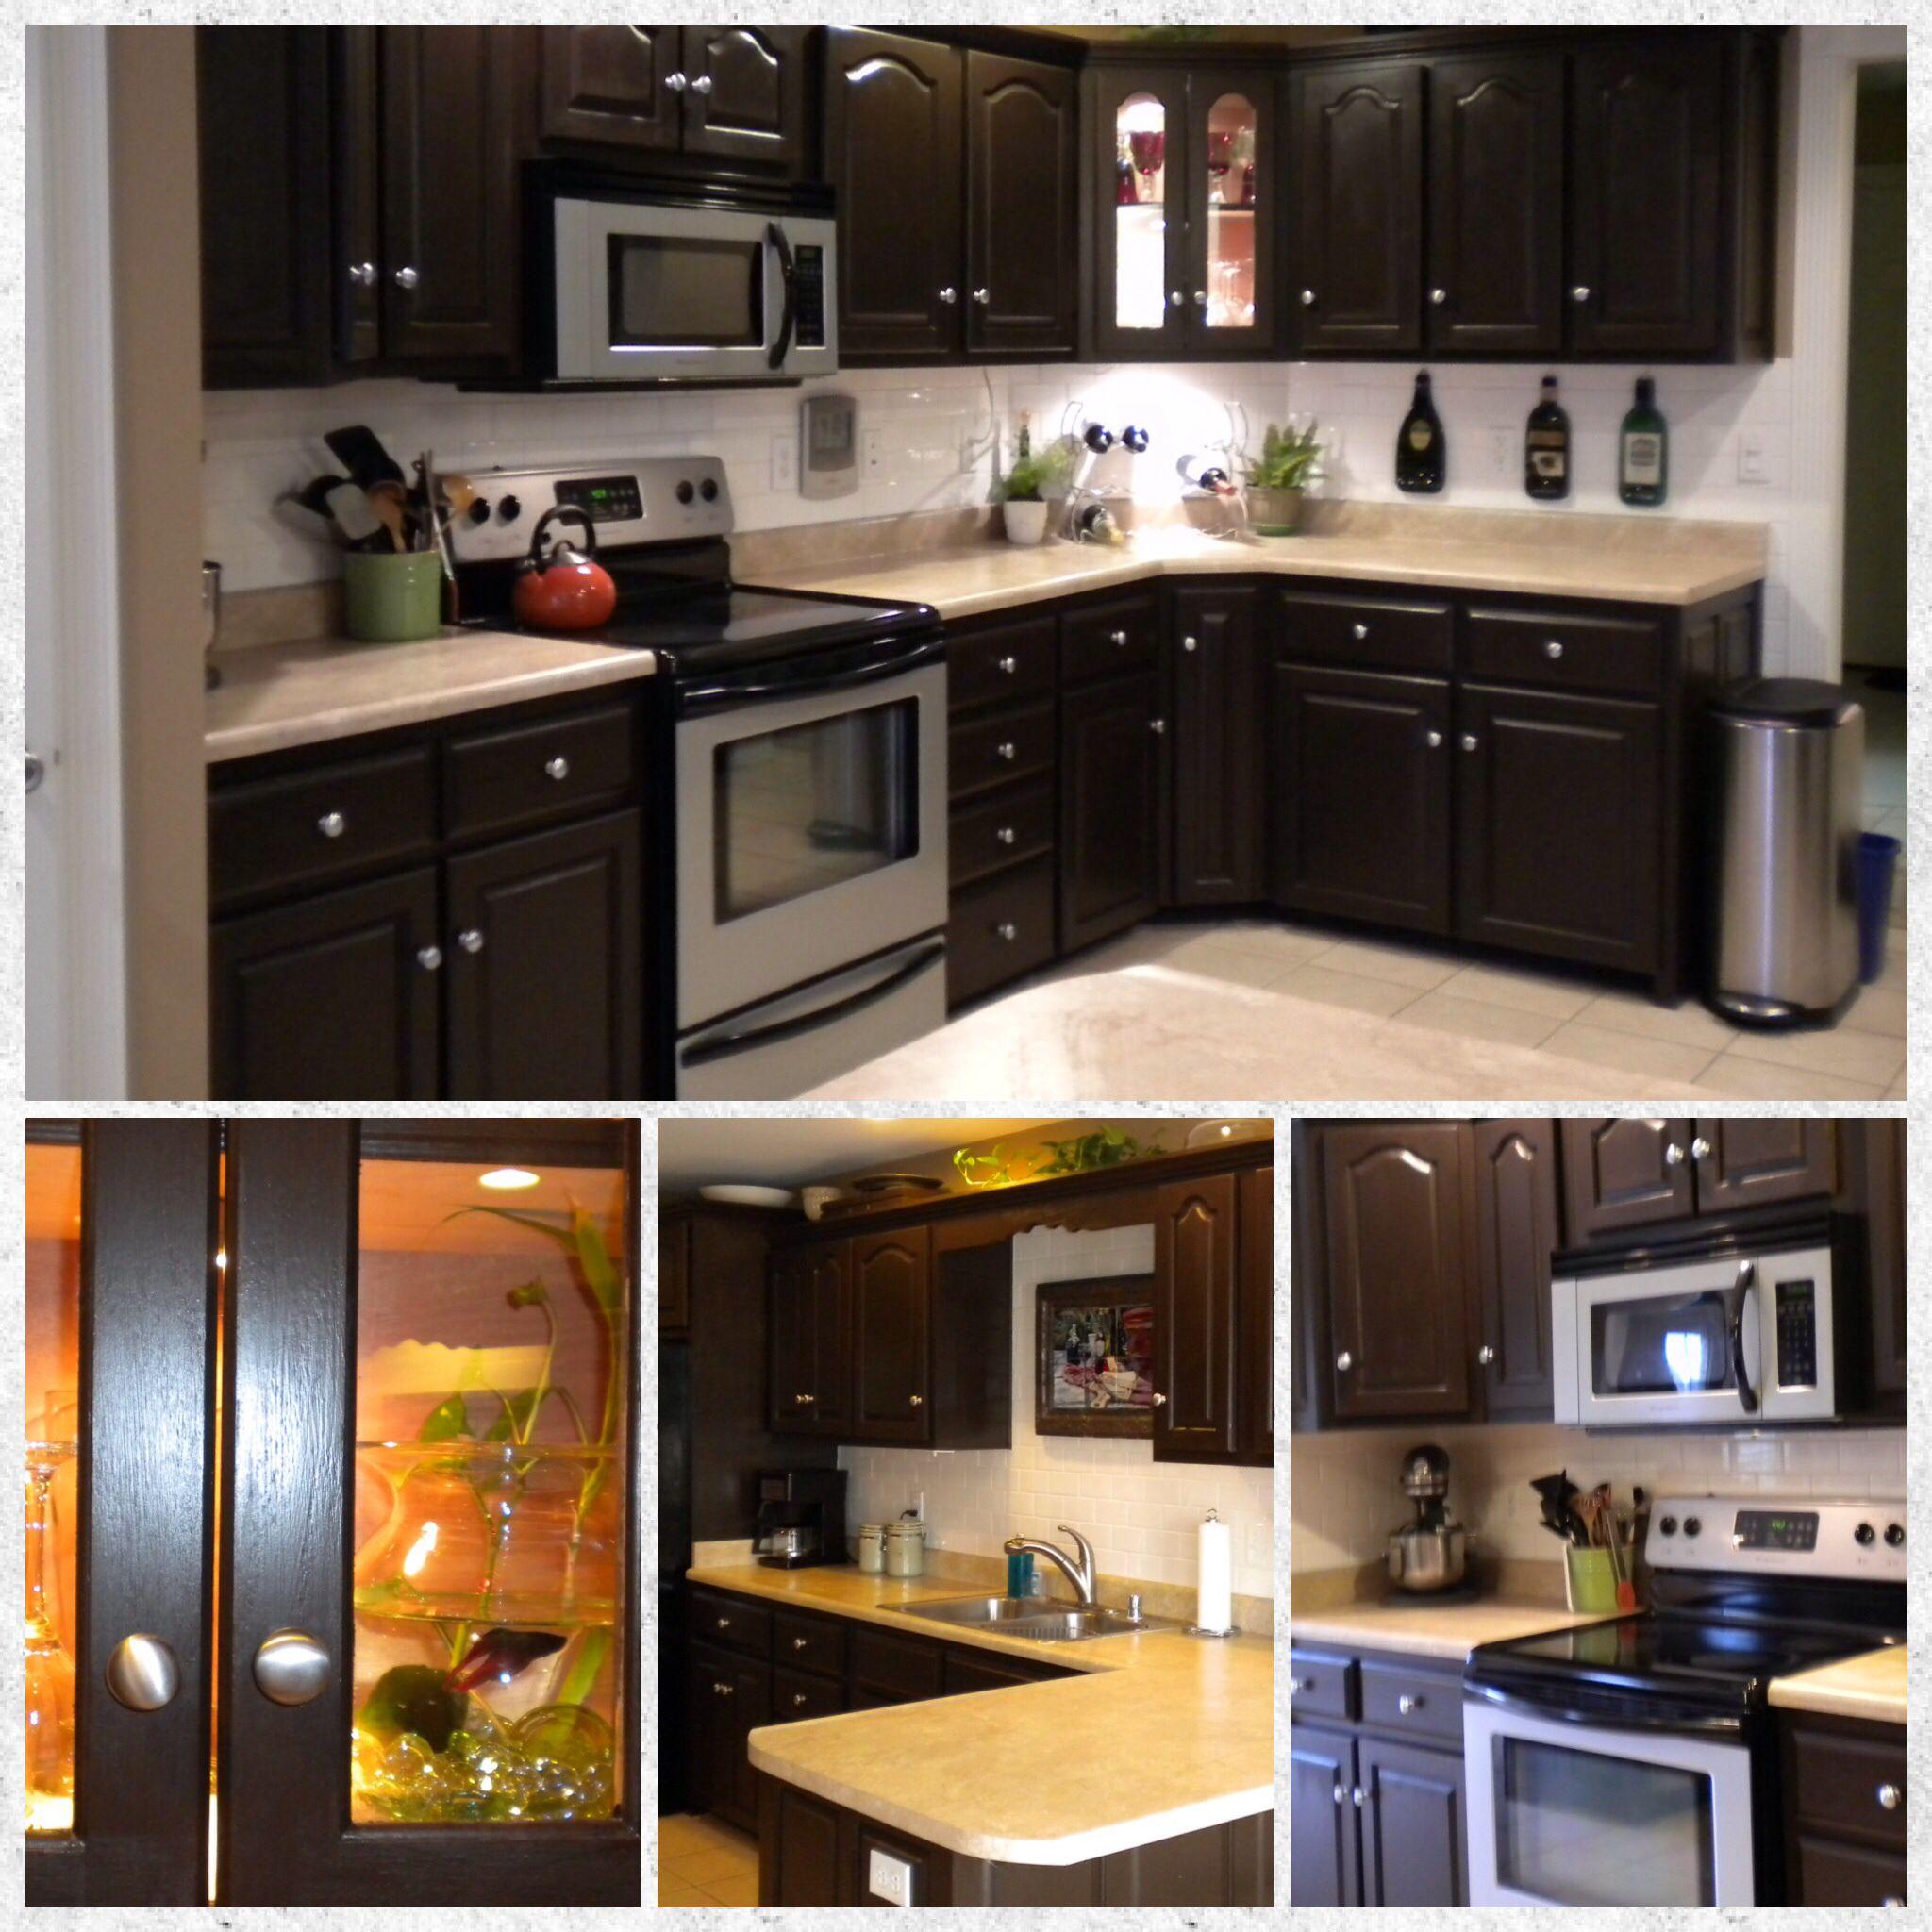 Refinishing Oak Kitchen Cabinets Ideas: My Kitchen Refinished Oak Cabinets Added Subway Tile